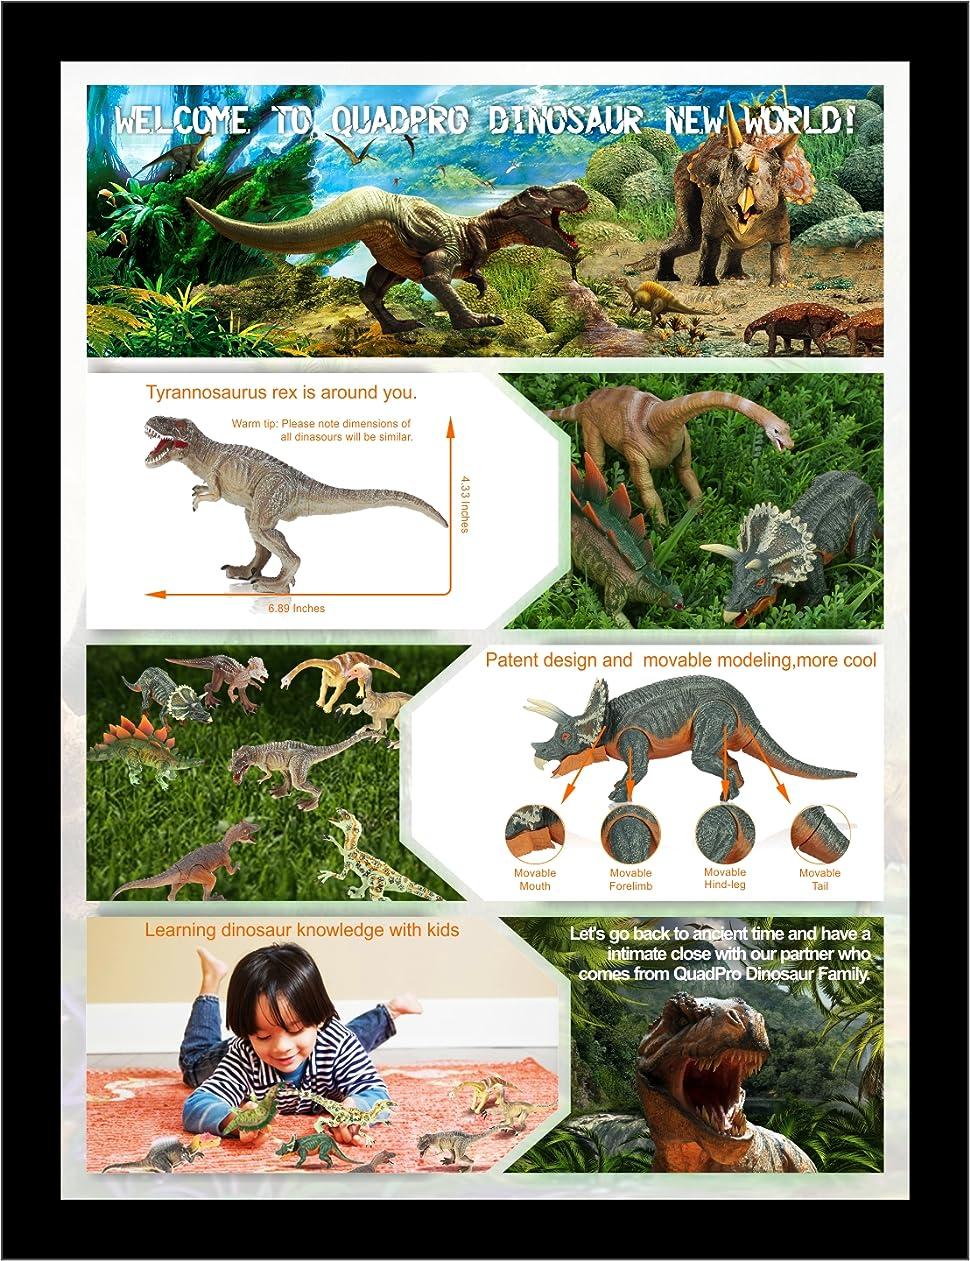 amazon com quadpro dinosaur toys sets for kids 8 piece jumbo